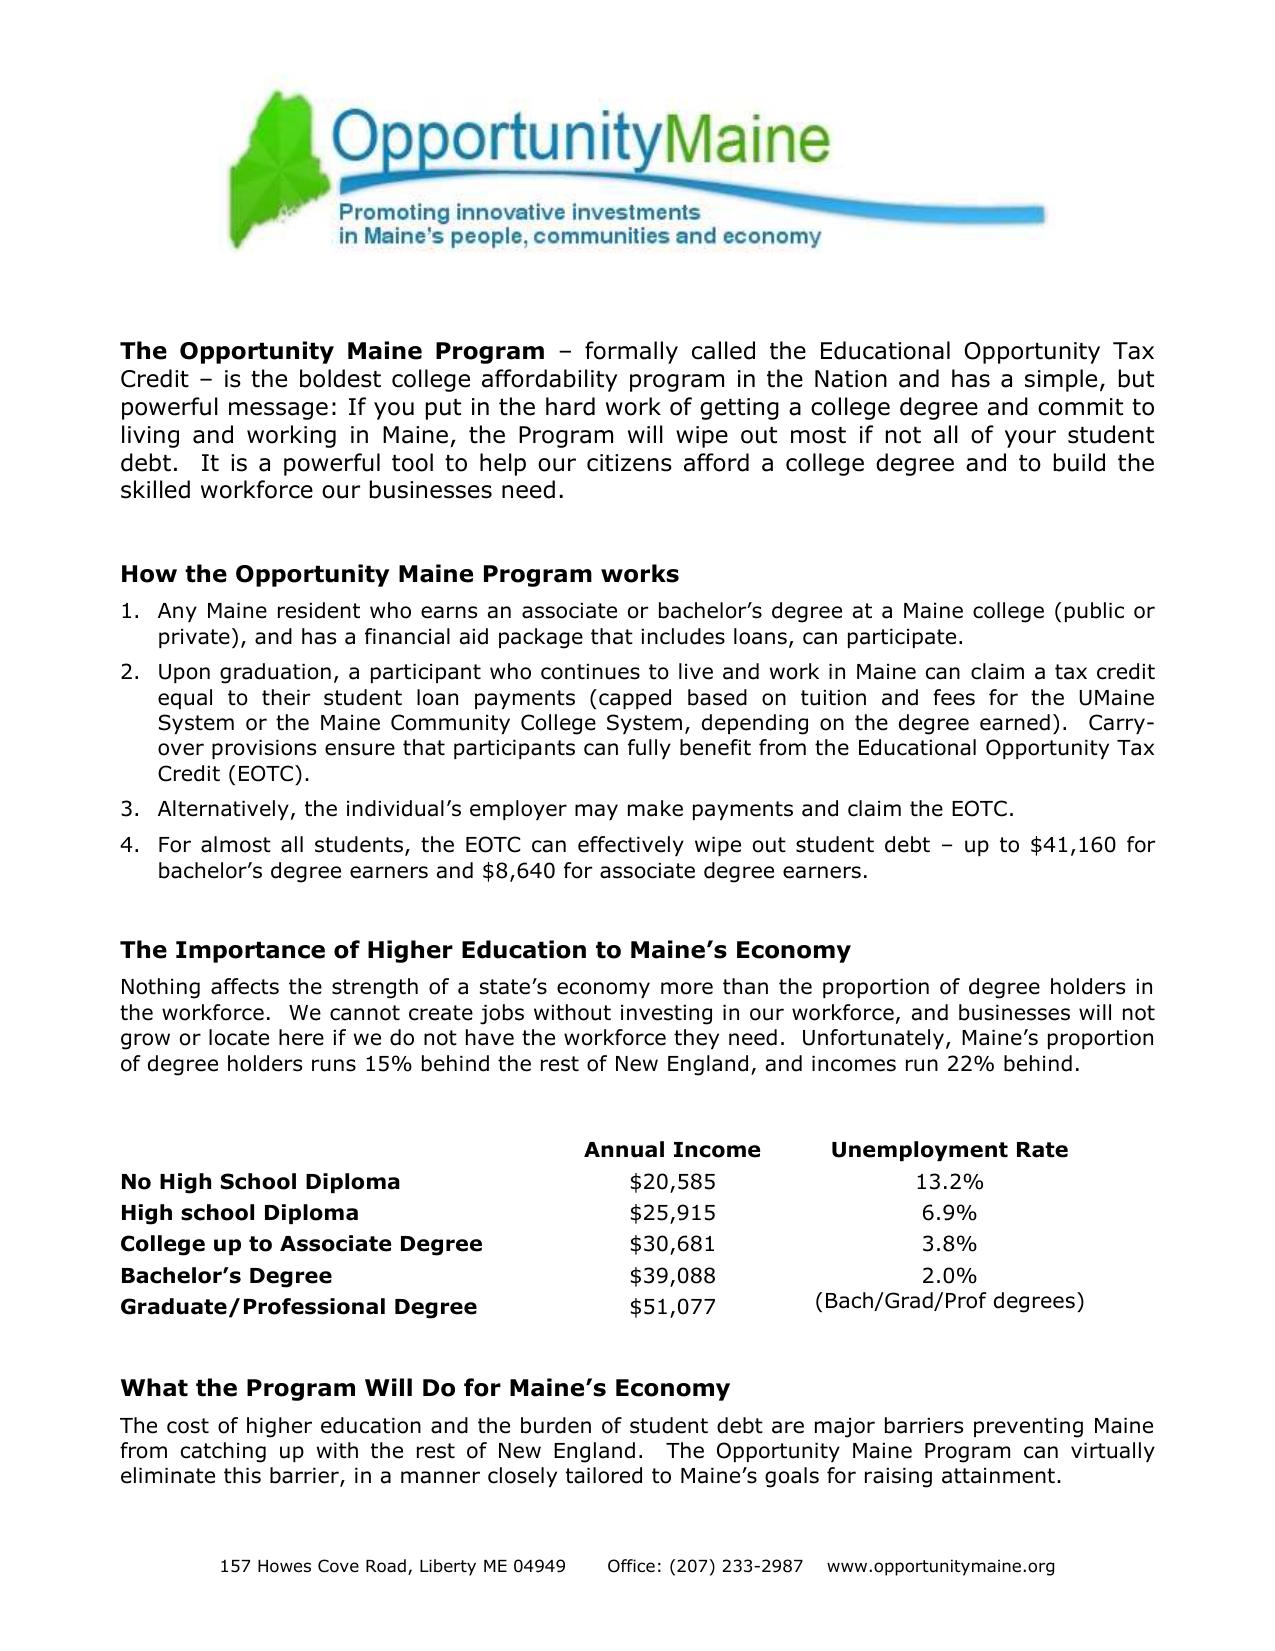 Opportunity Maine Program Summary